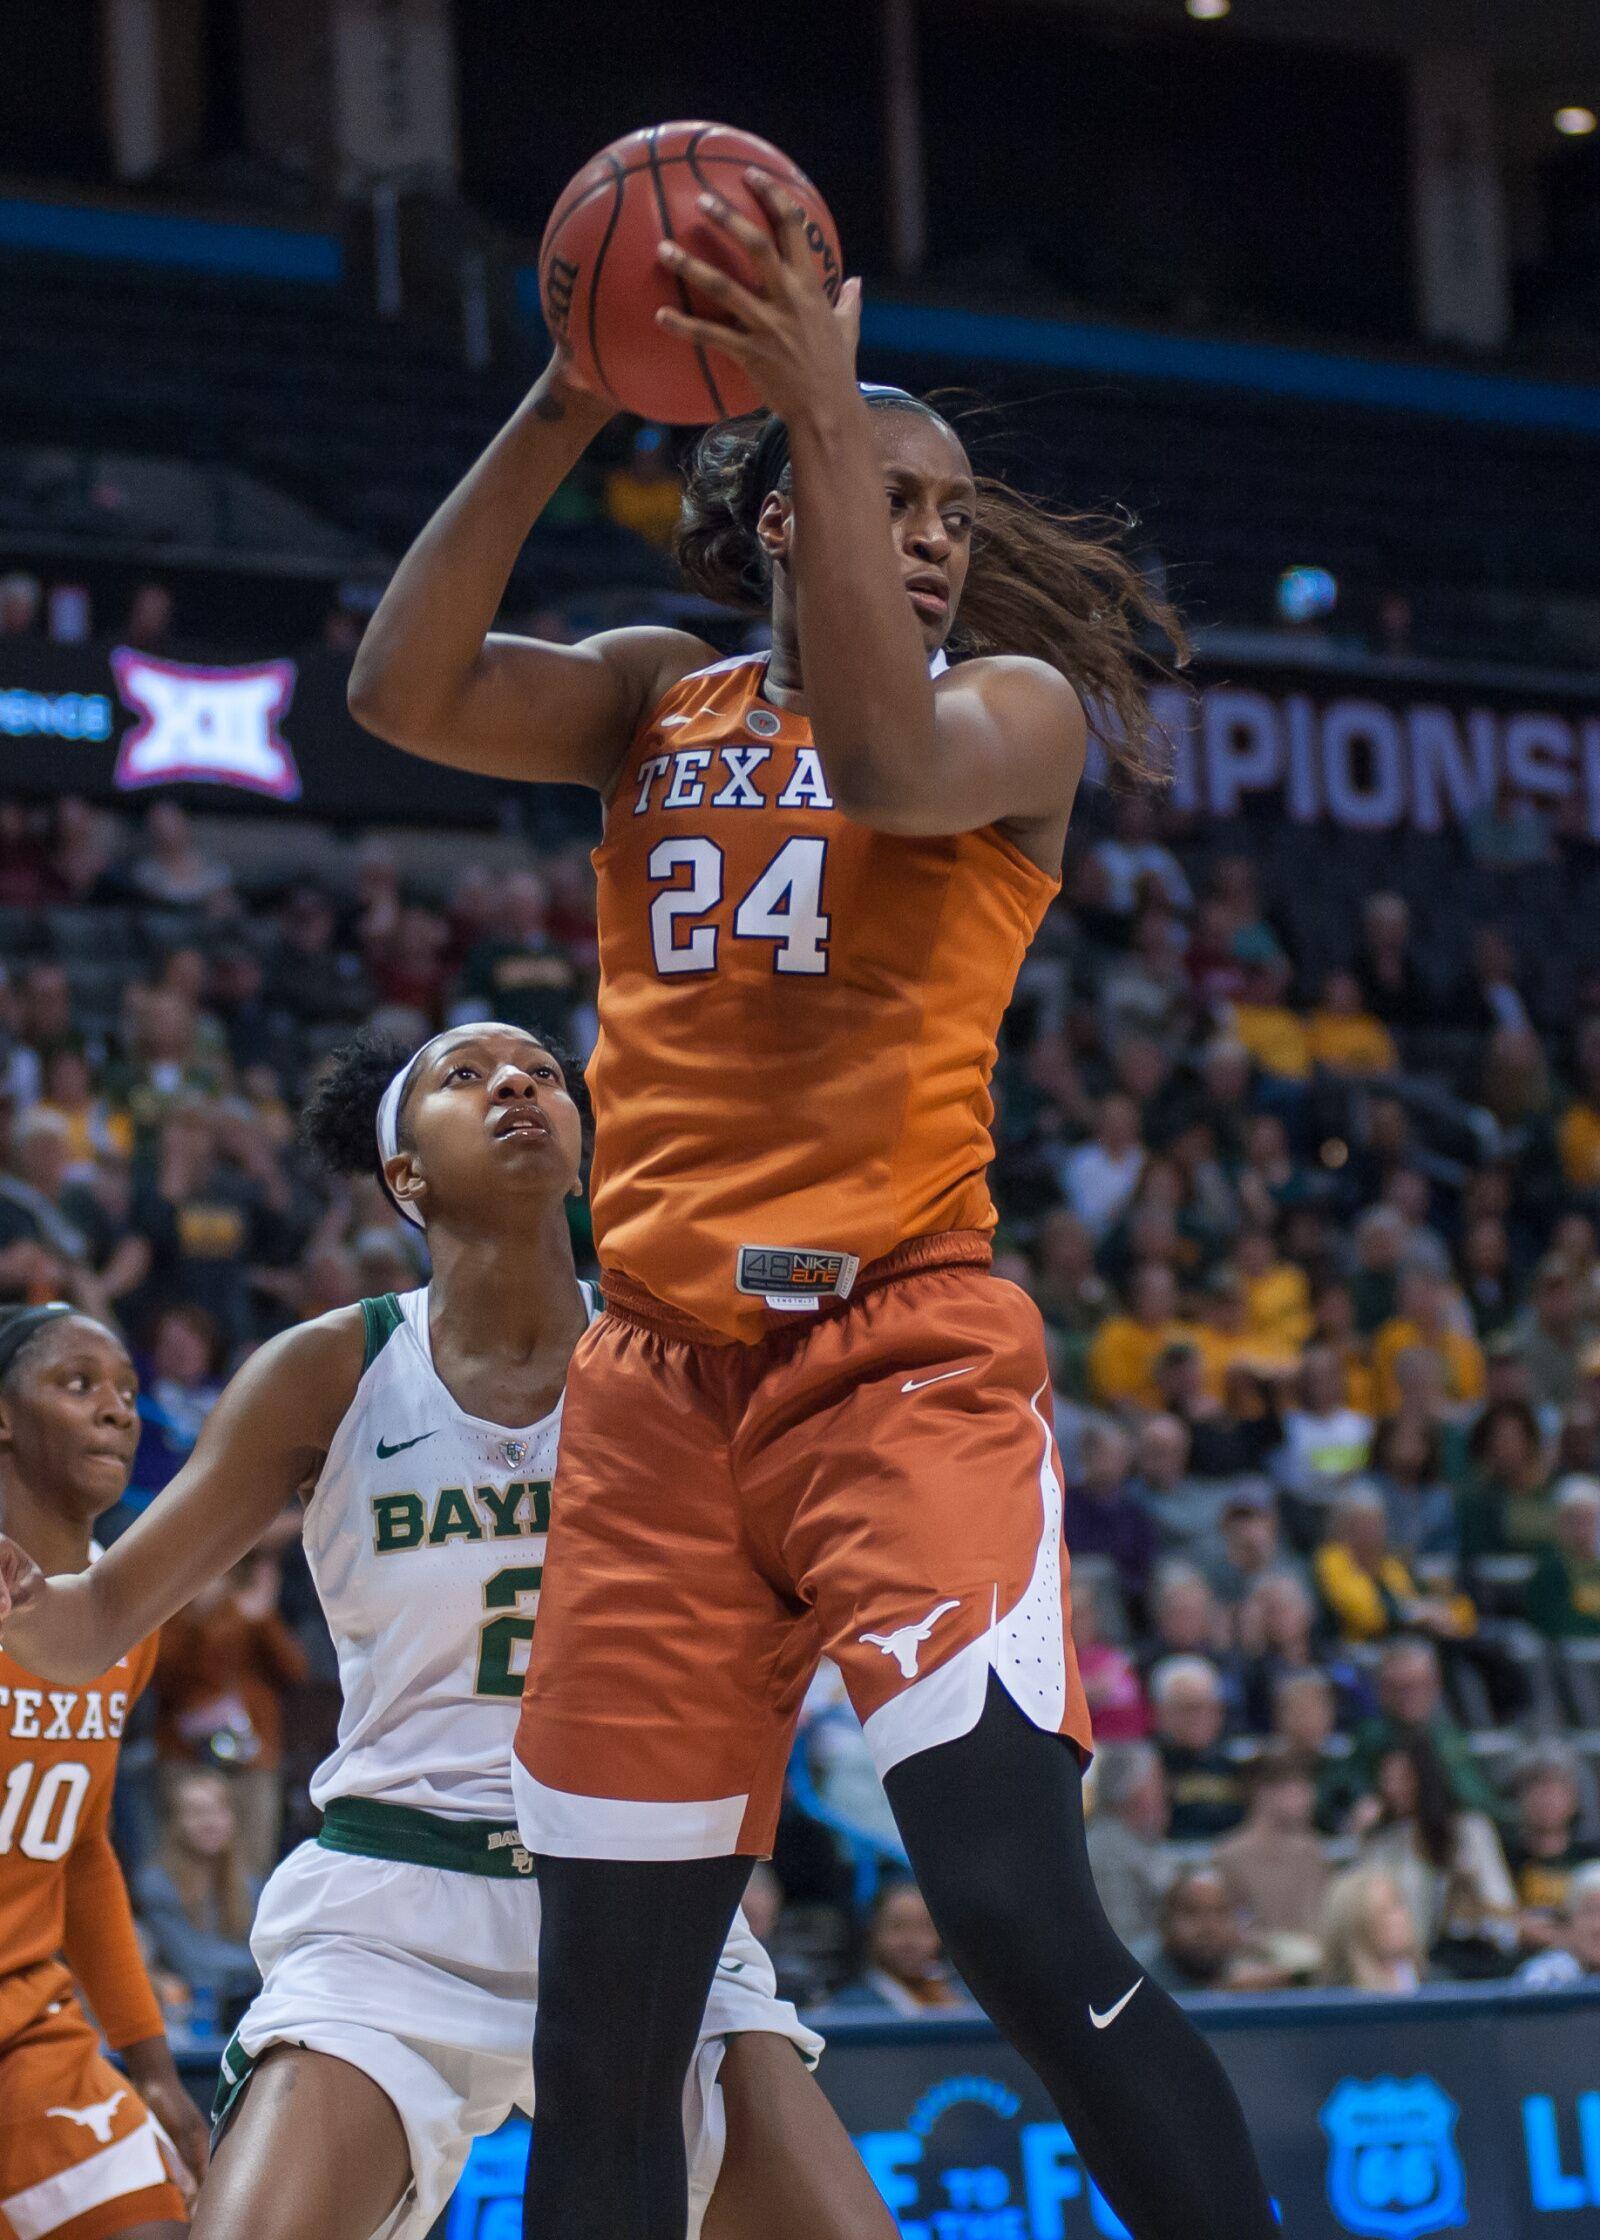 PODCAST: Texas forward Joyner Holmes on love and loss of basketball